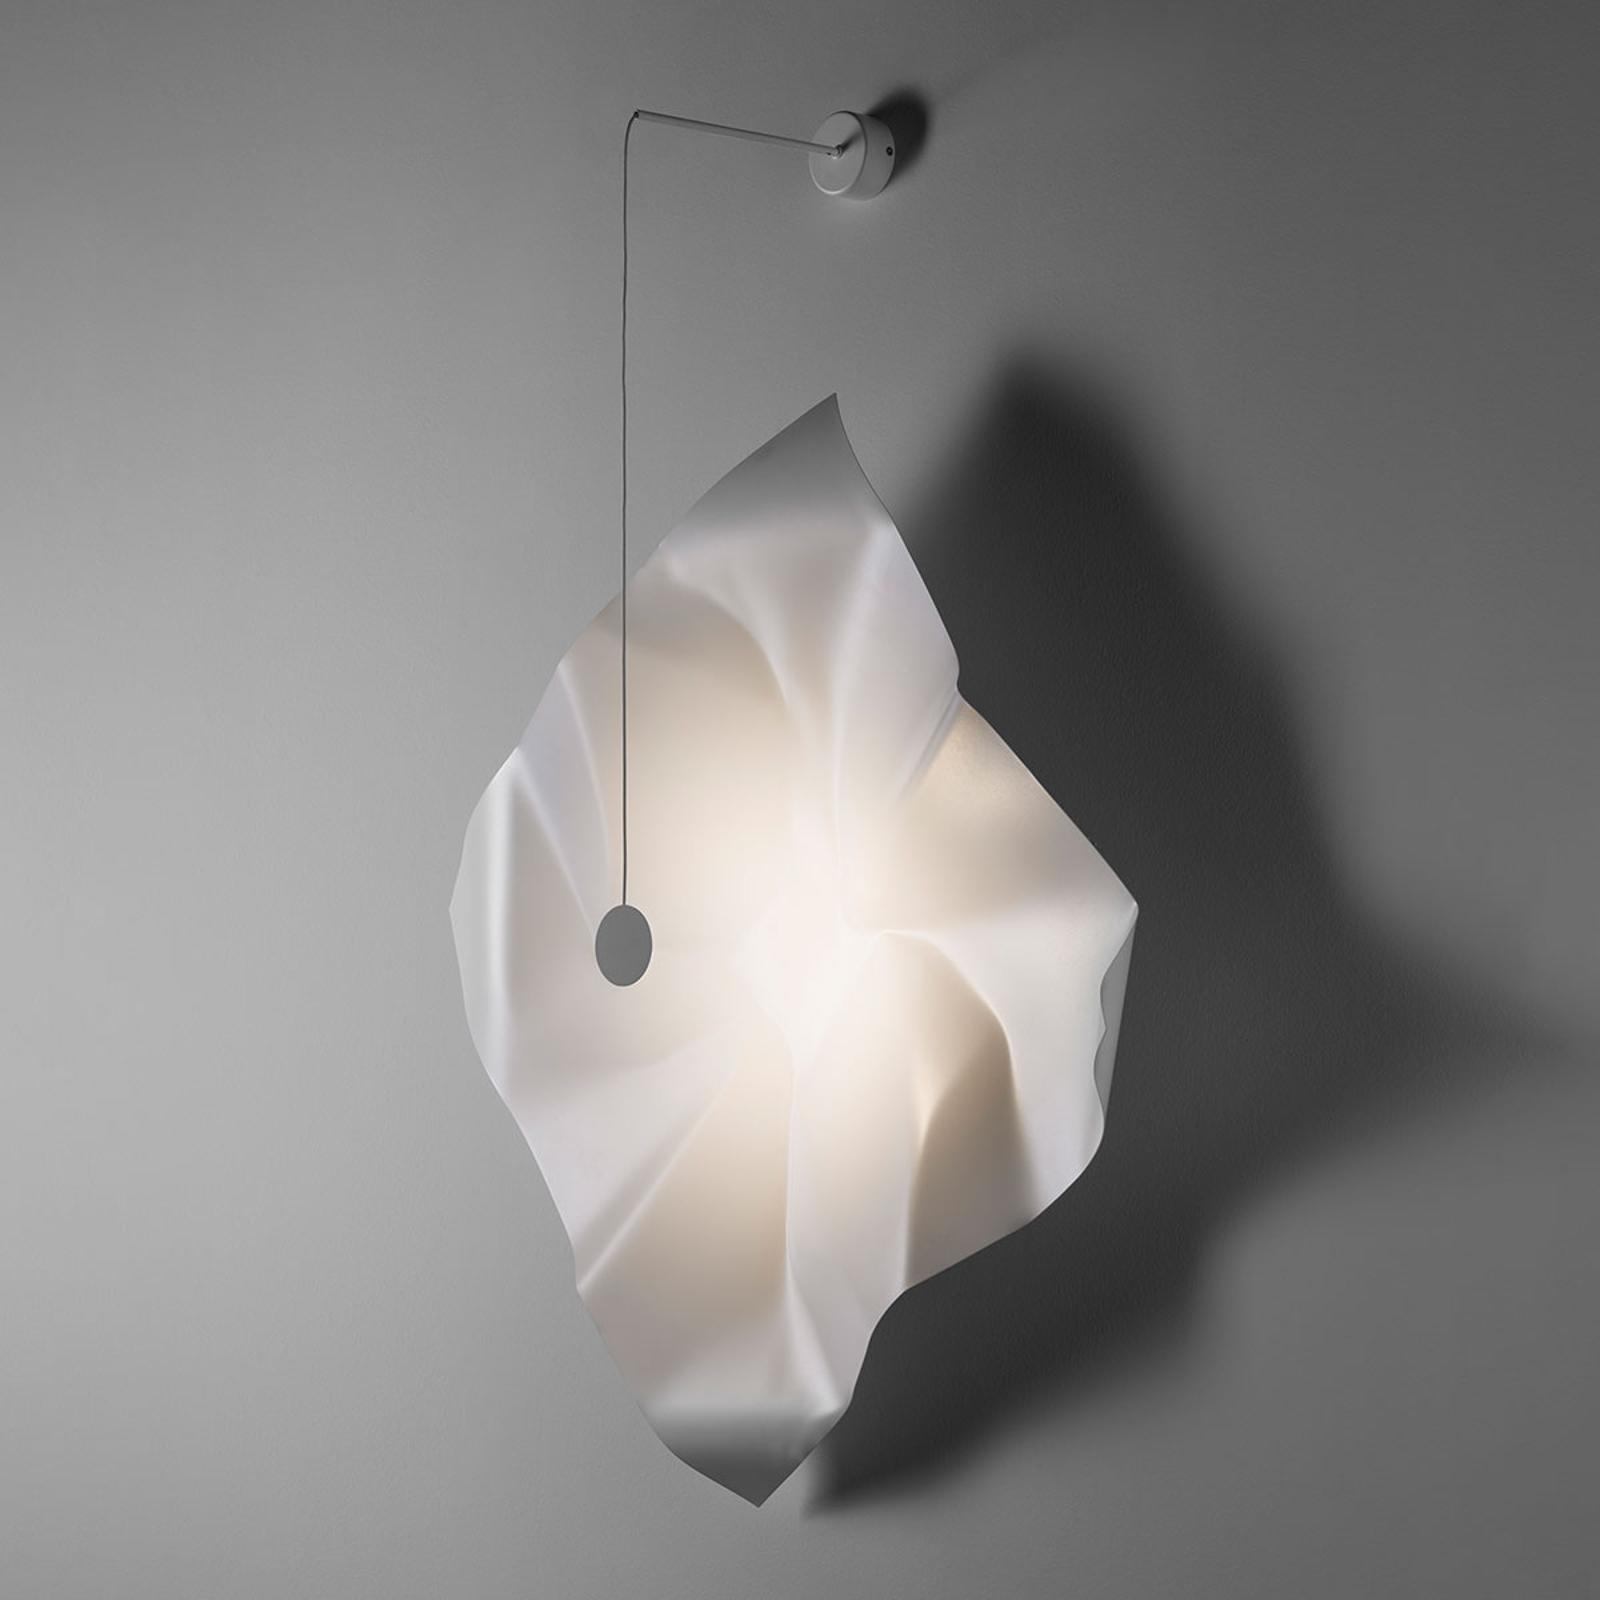 Knikerboker Crash LED-Wandleuchte weiß quadratisch